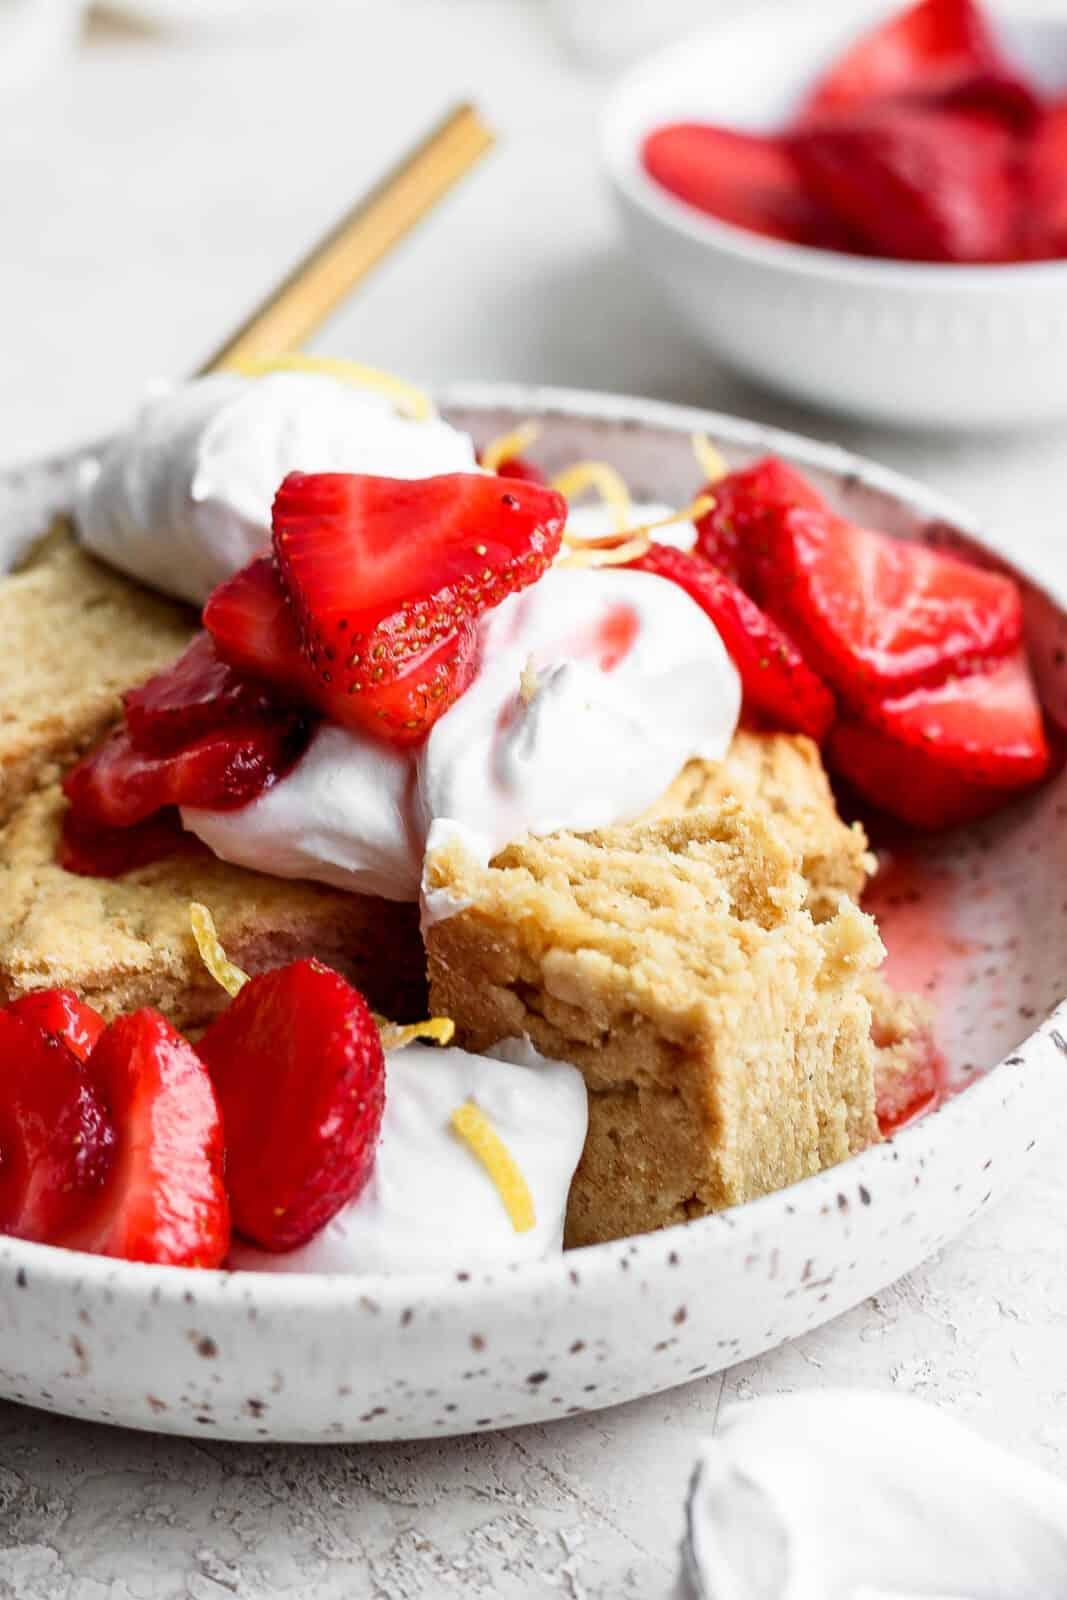 Bowl of gluten free strawberry shortcake.